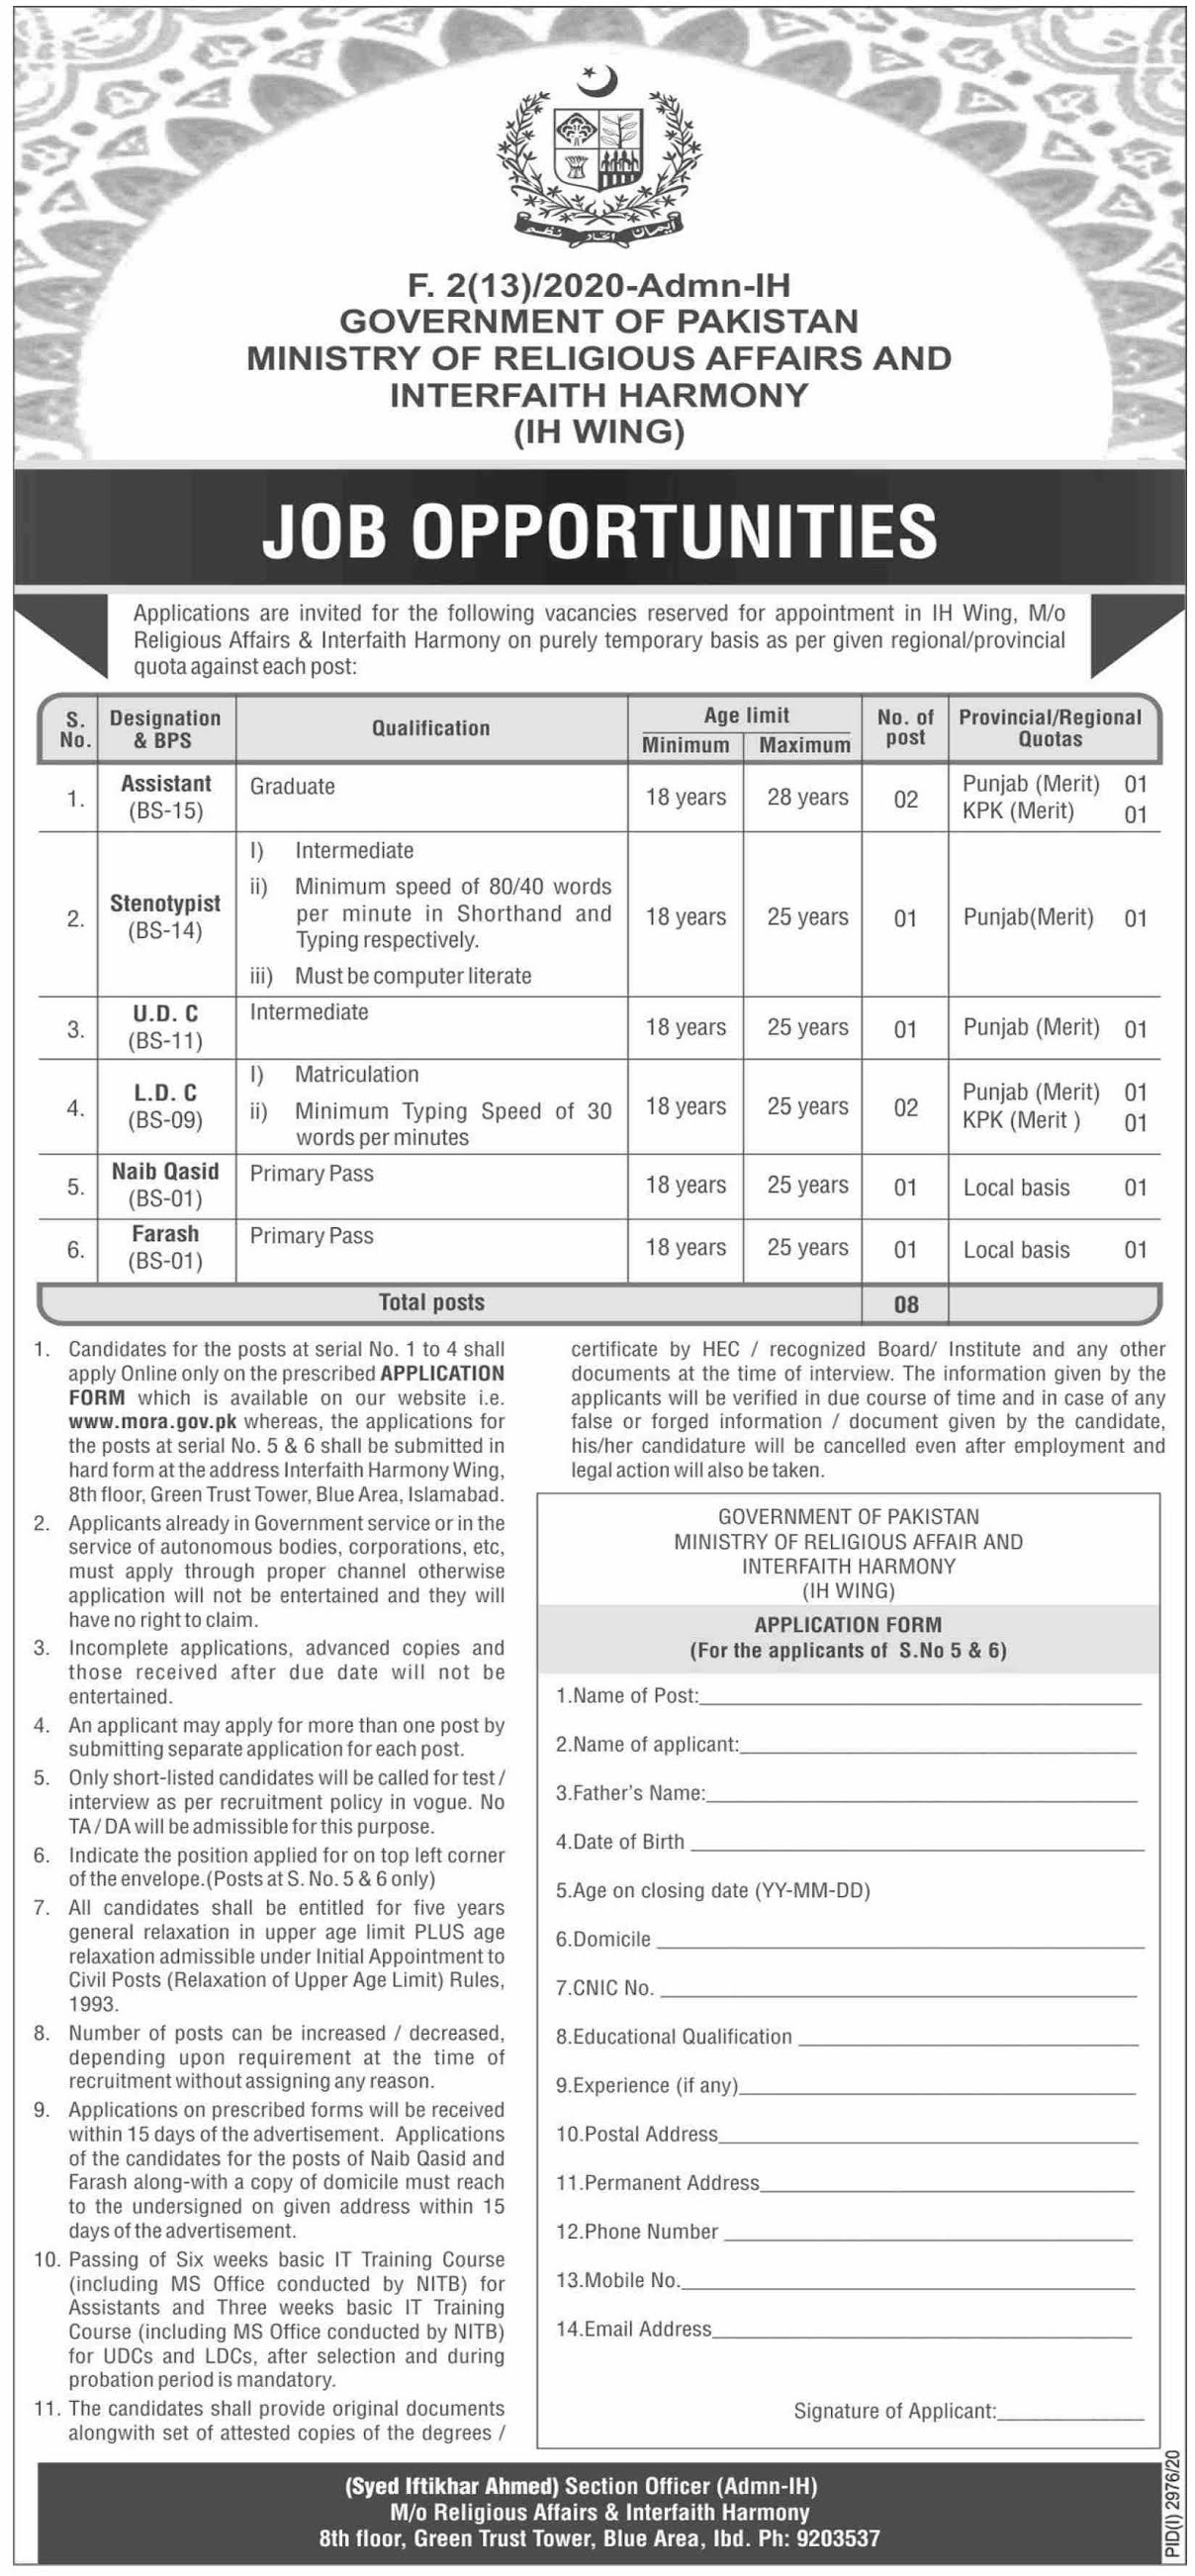 Religious Minister of Pakistan Ministry of Religious Affairs Pakistan - Download Job Application Form - www.mora.gov.pk New Jobs 2021